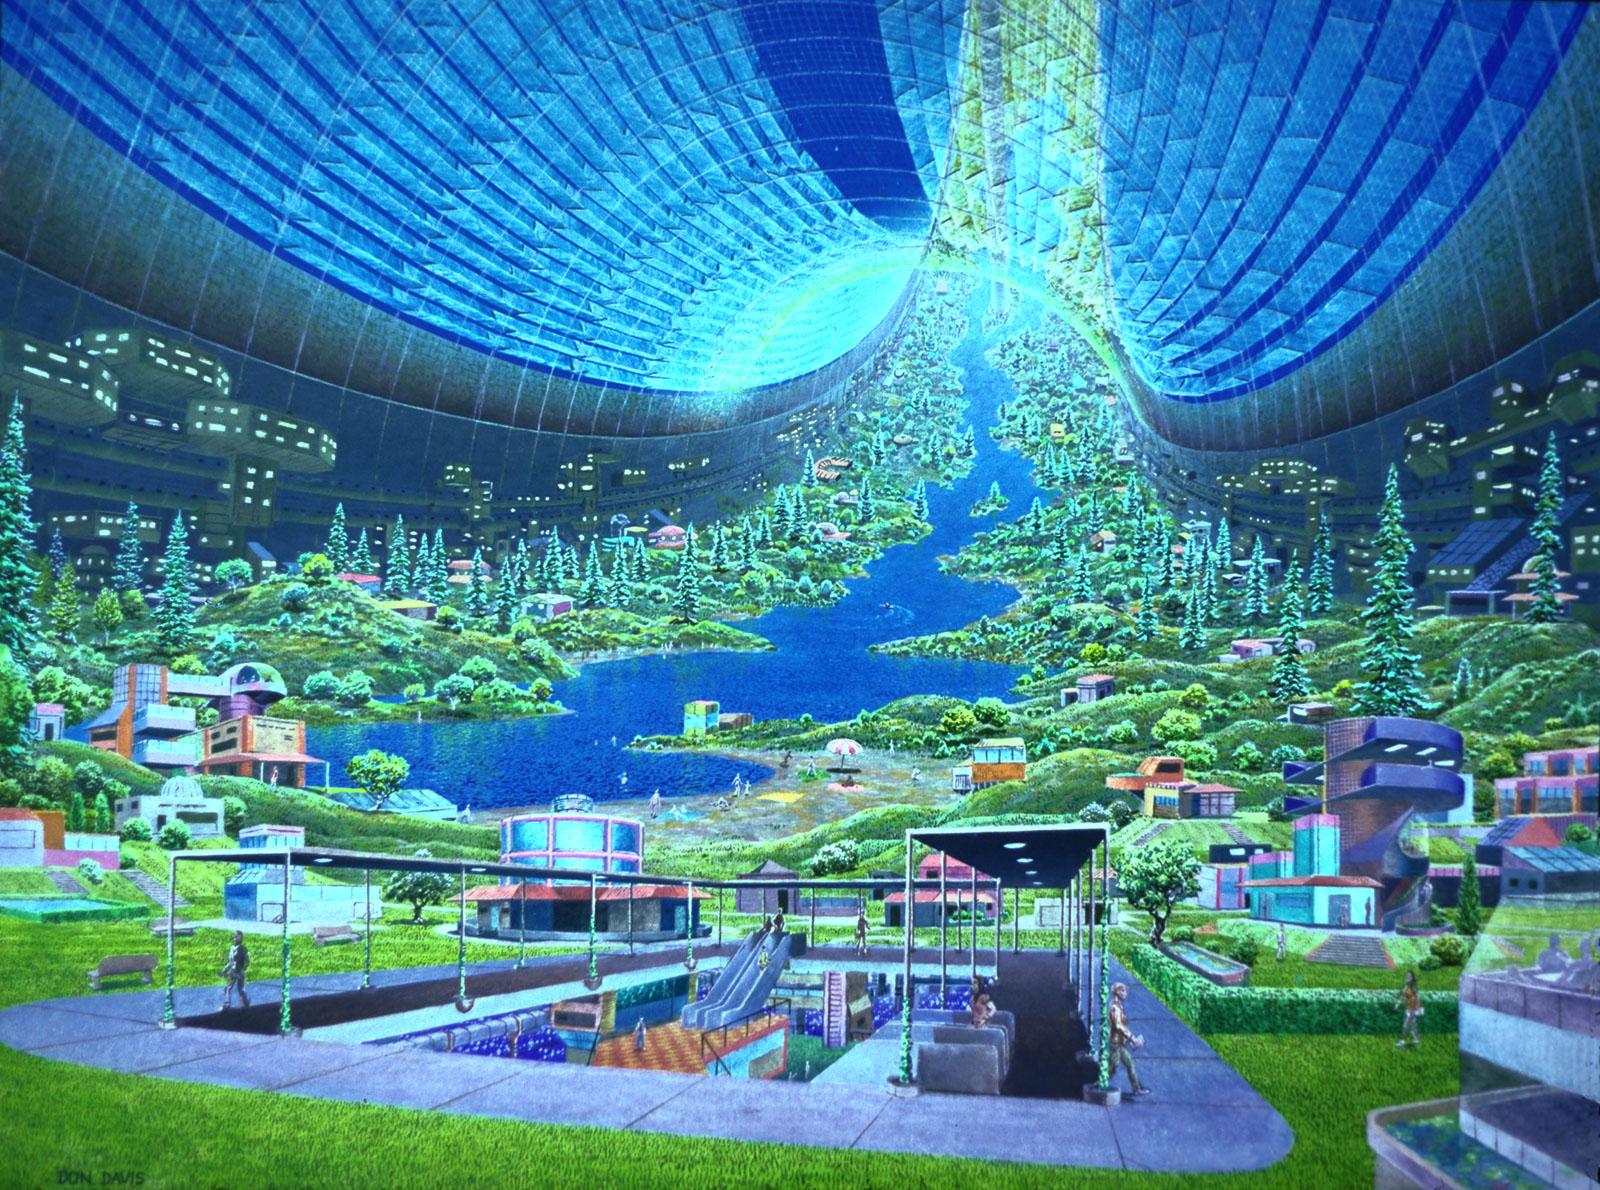 Our Biotech Future' – Freeman Dyson | Anthropology net